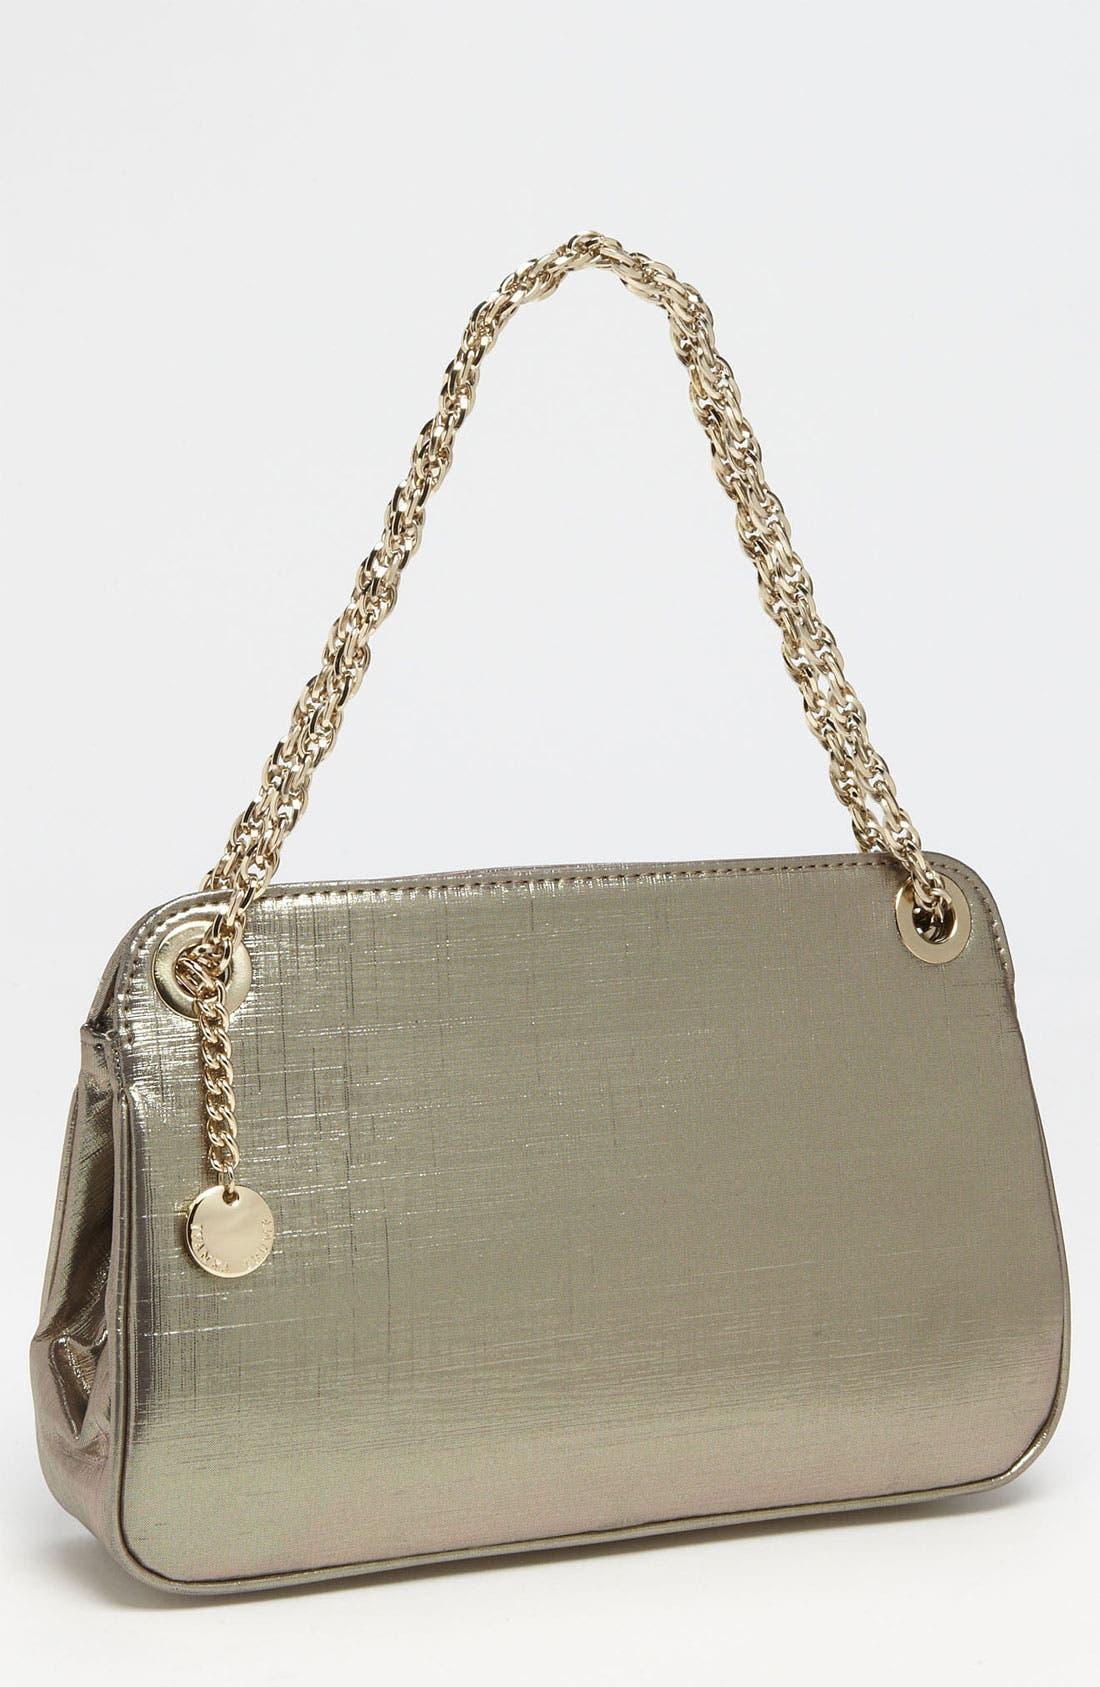 Alternate Image 1 Selected - Ivanka Trump 'Cynthia' Shoulder Bag